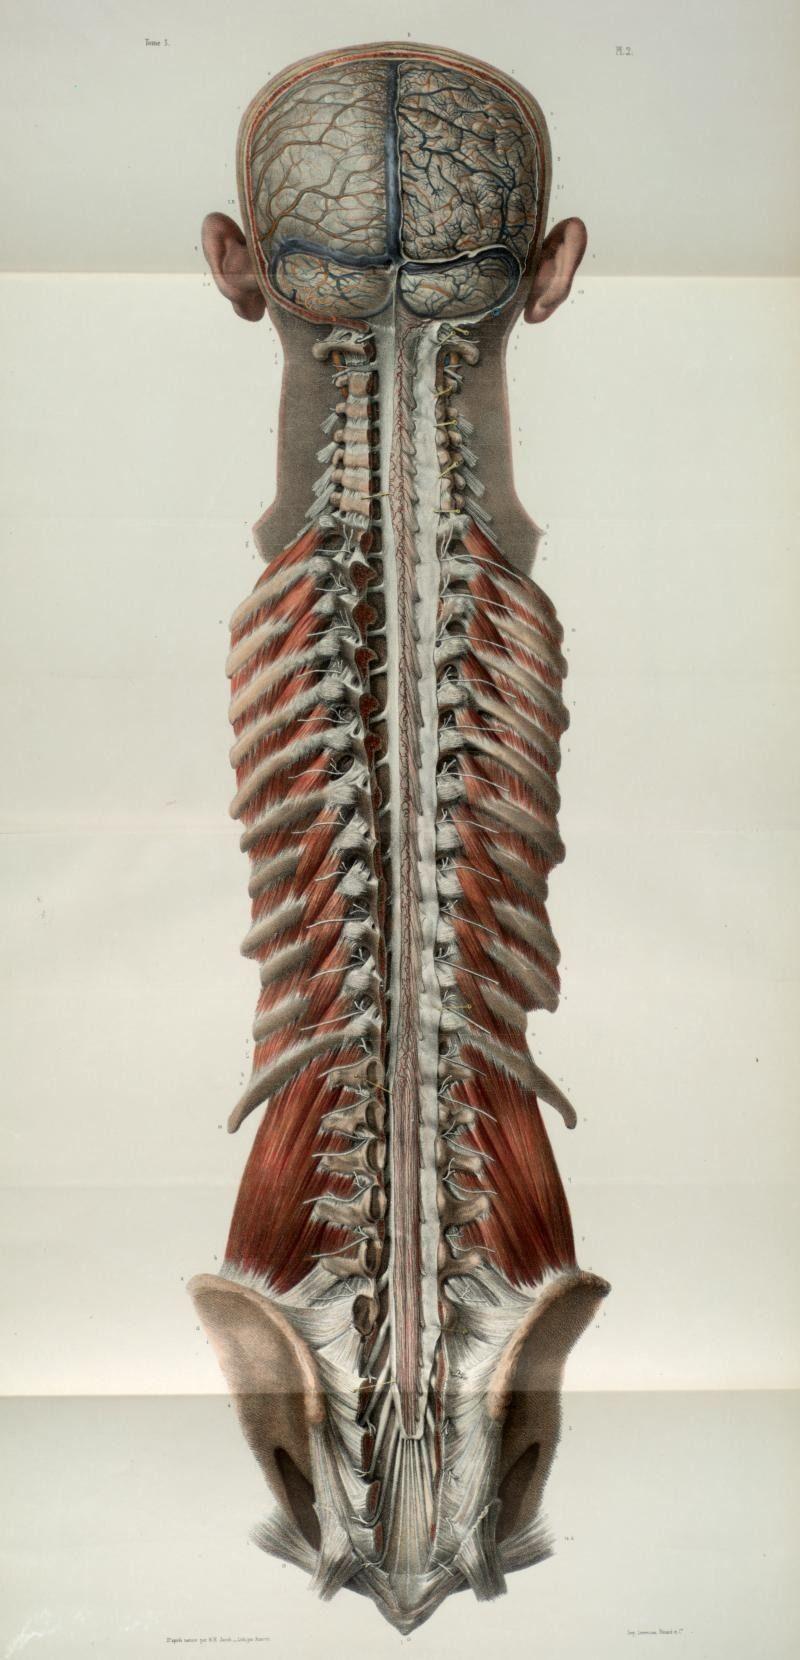 Pin de Nasi en Анатомия. Иллюстрация | Pinterest | Anatomía ...